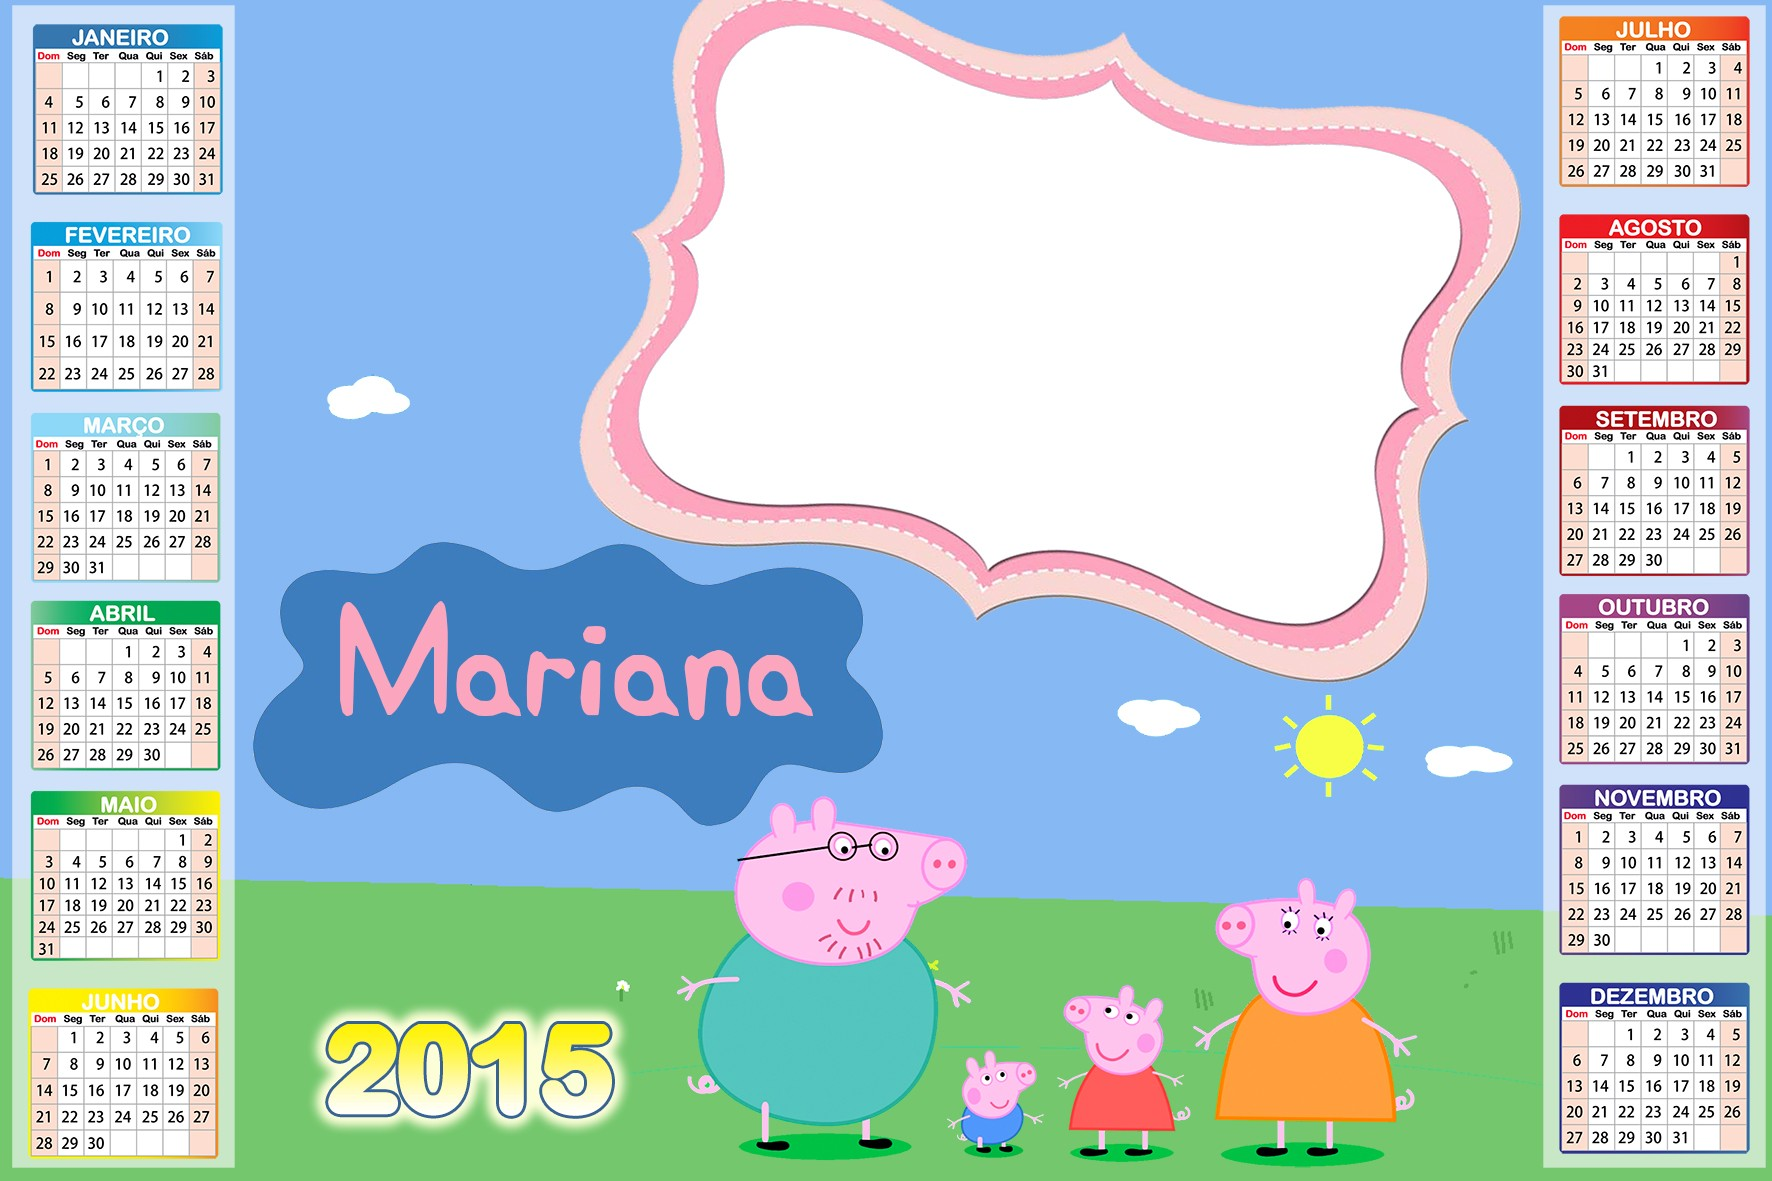 calendario c ima peppa pig peppa pig